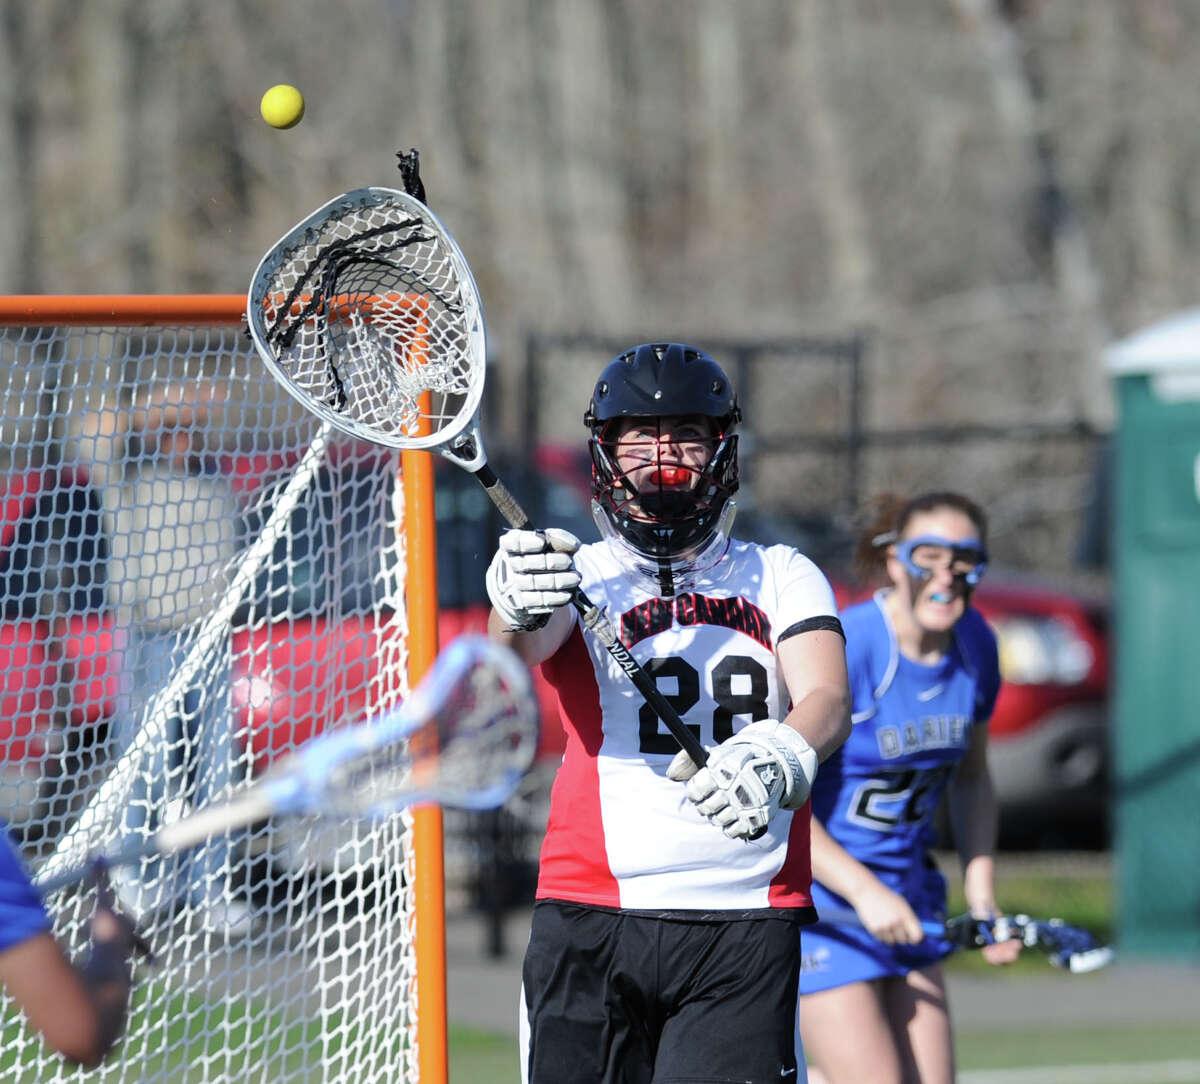 Goalie Liz O'Sullivan # 28 of New Canaan passes during the girls high school lacrosse match between New Canaan High School and Darien High School at New Canaan, Thursday, April 25, 2013. Darien won the match, 14-7.